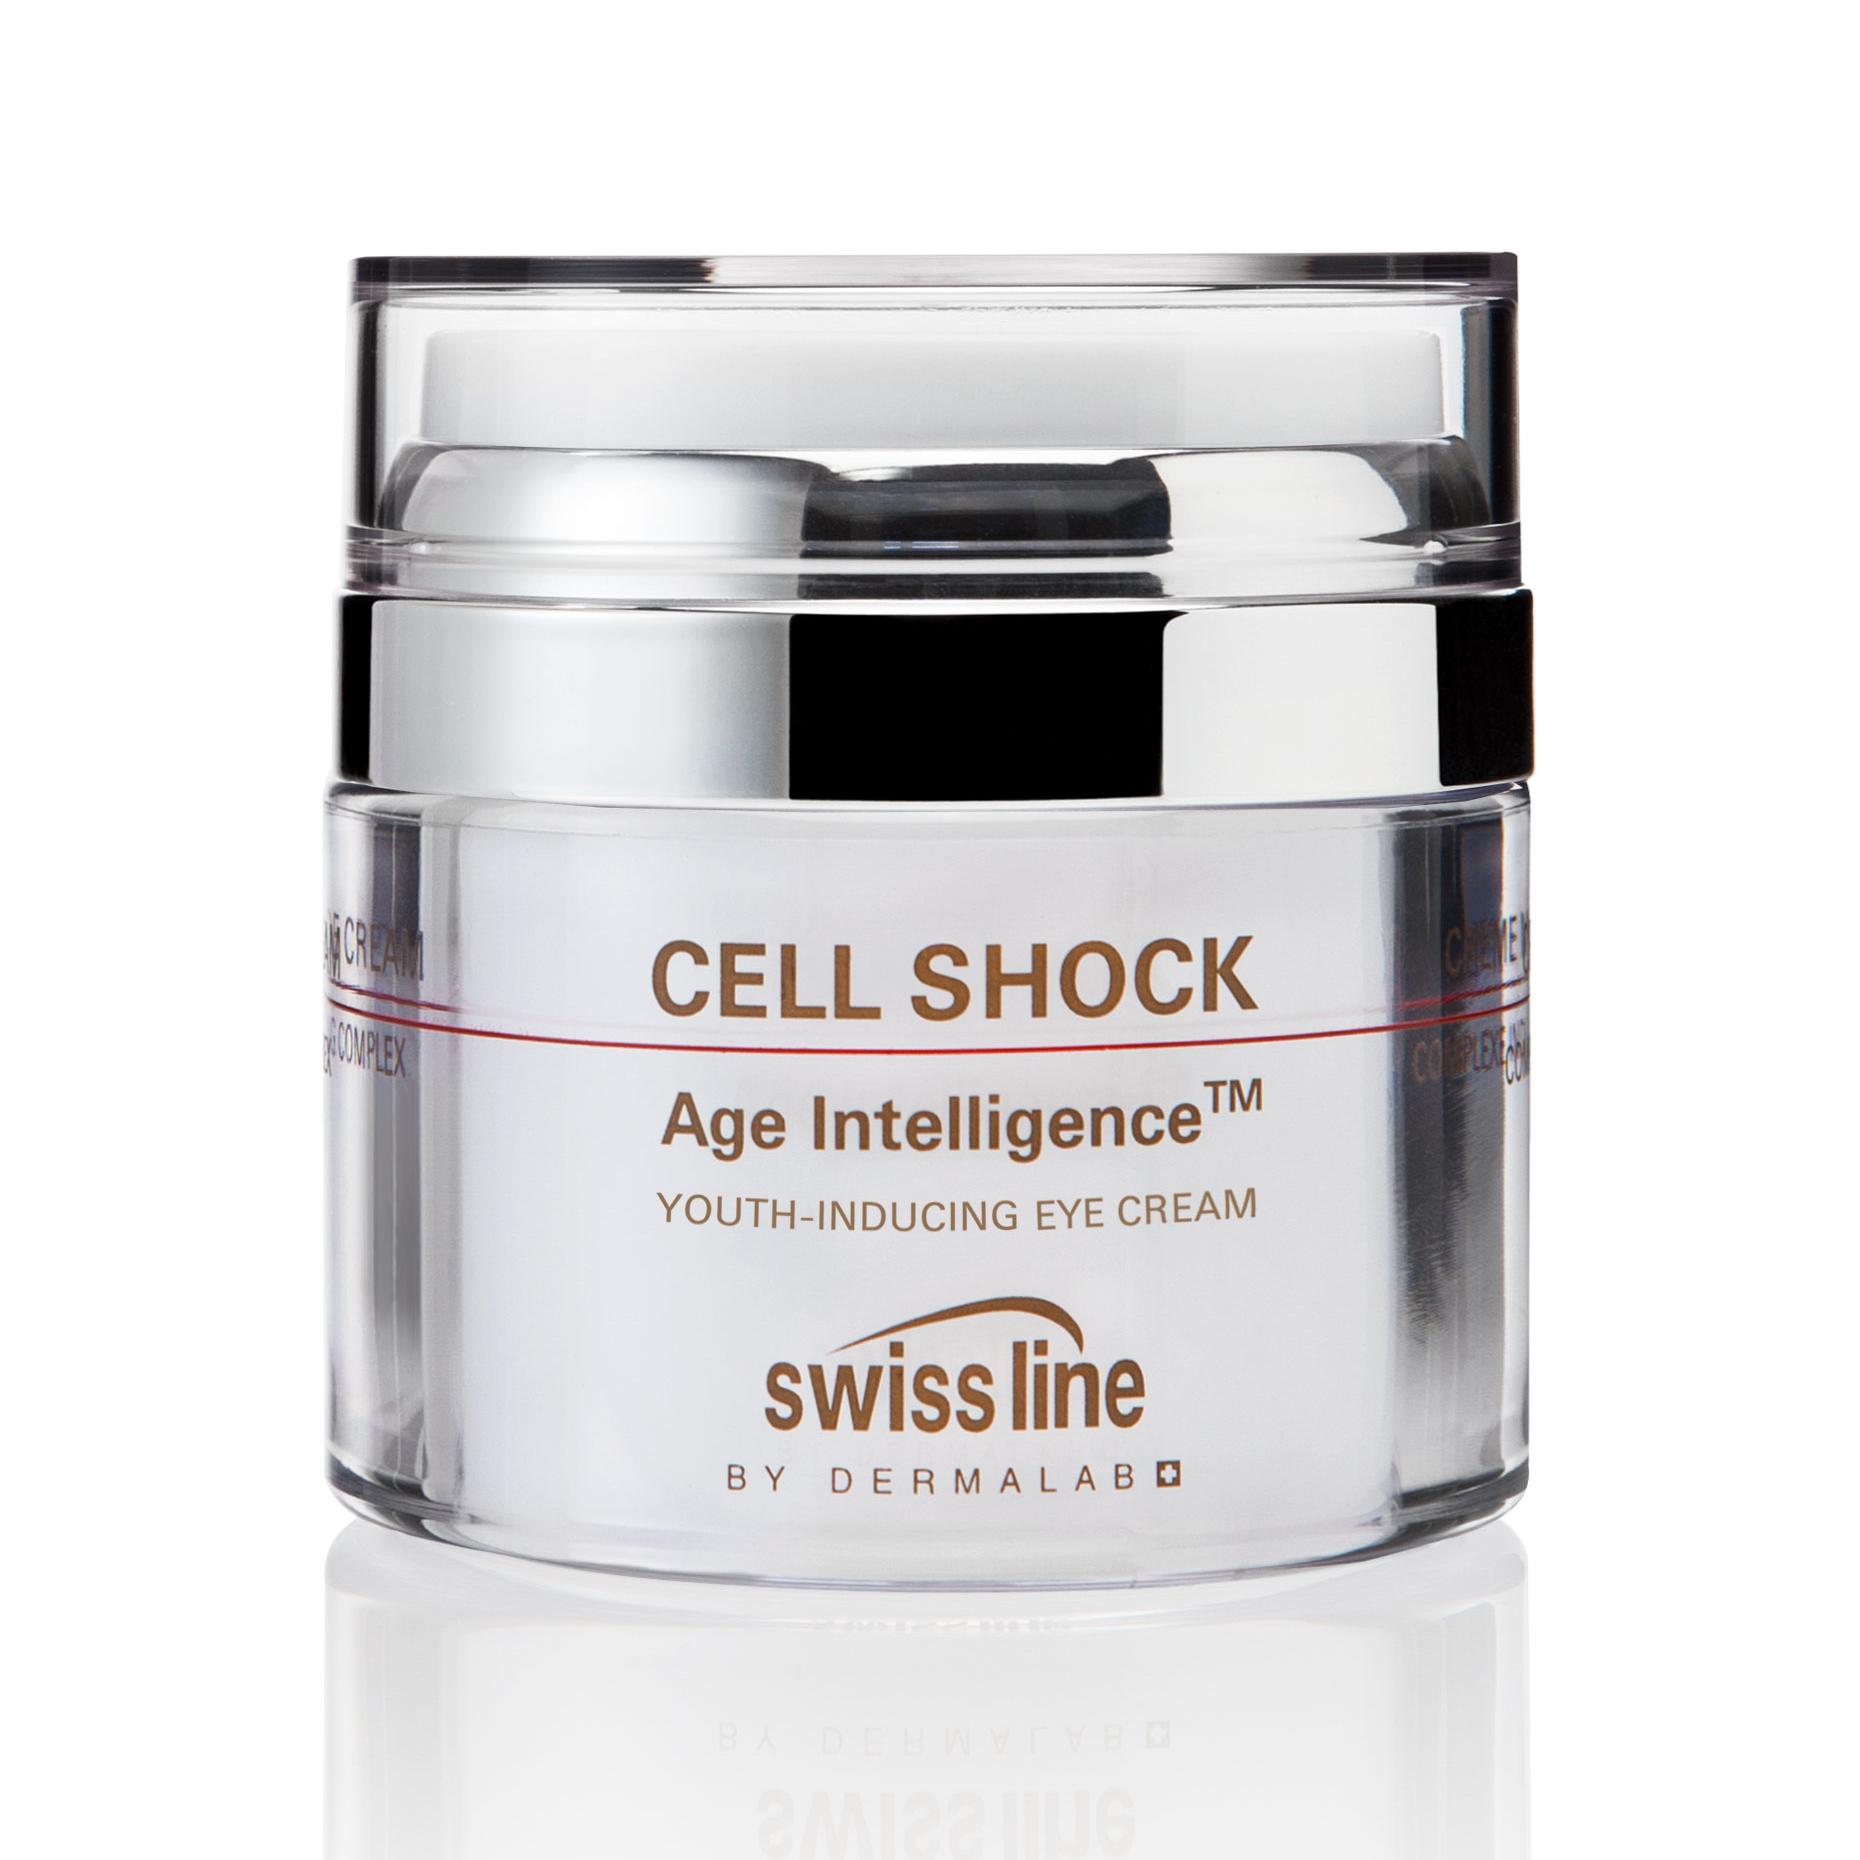 Kem trẻ hóa da vùng mắt Swissline Cell Shock Age IntelligenceTM Youth-Inducing Eye Cream